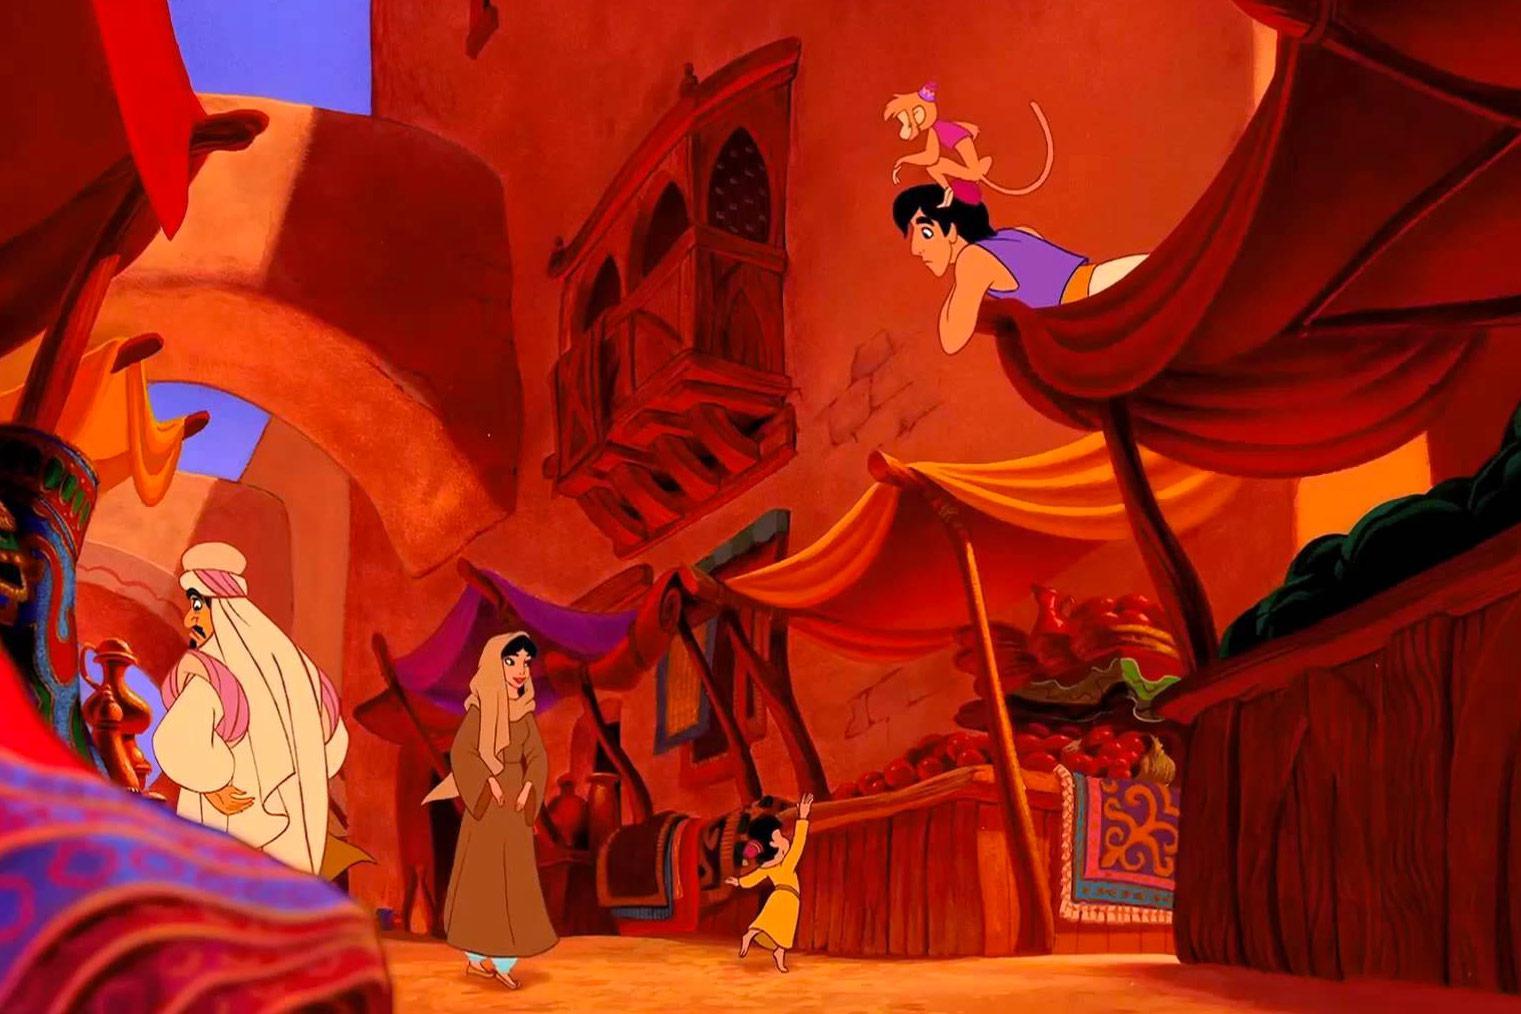 551f737e 47fb 4d5a 9b72 c416cd77482b 20 Things You Never Knew About Disney's Aladdin